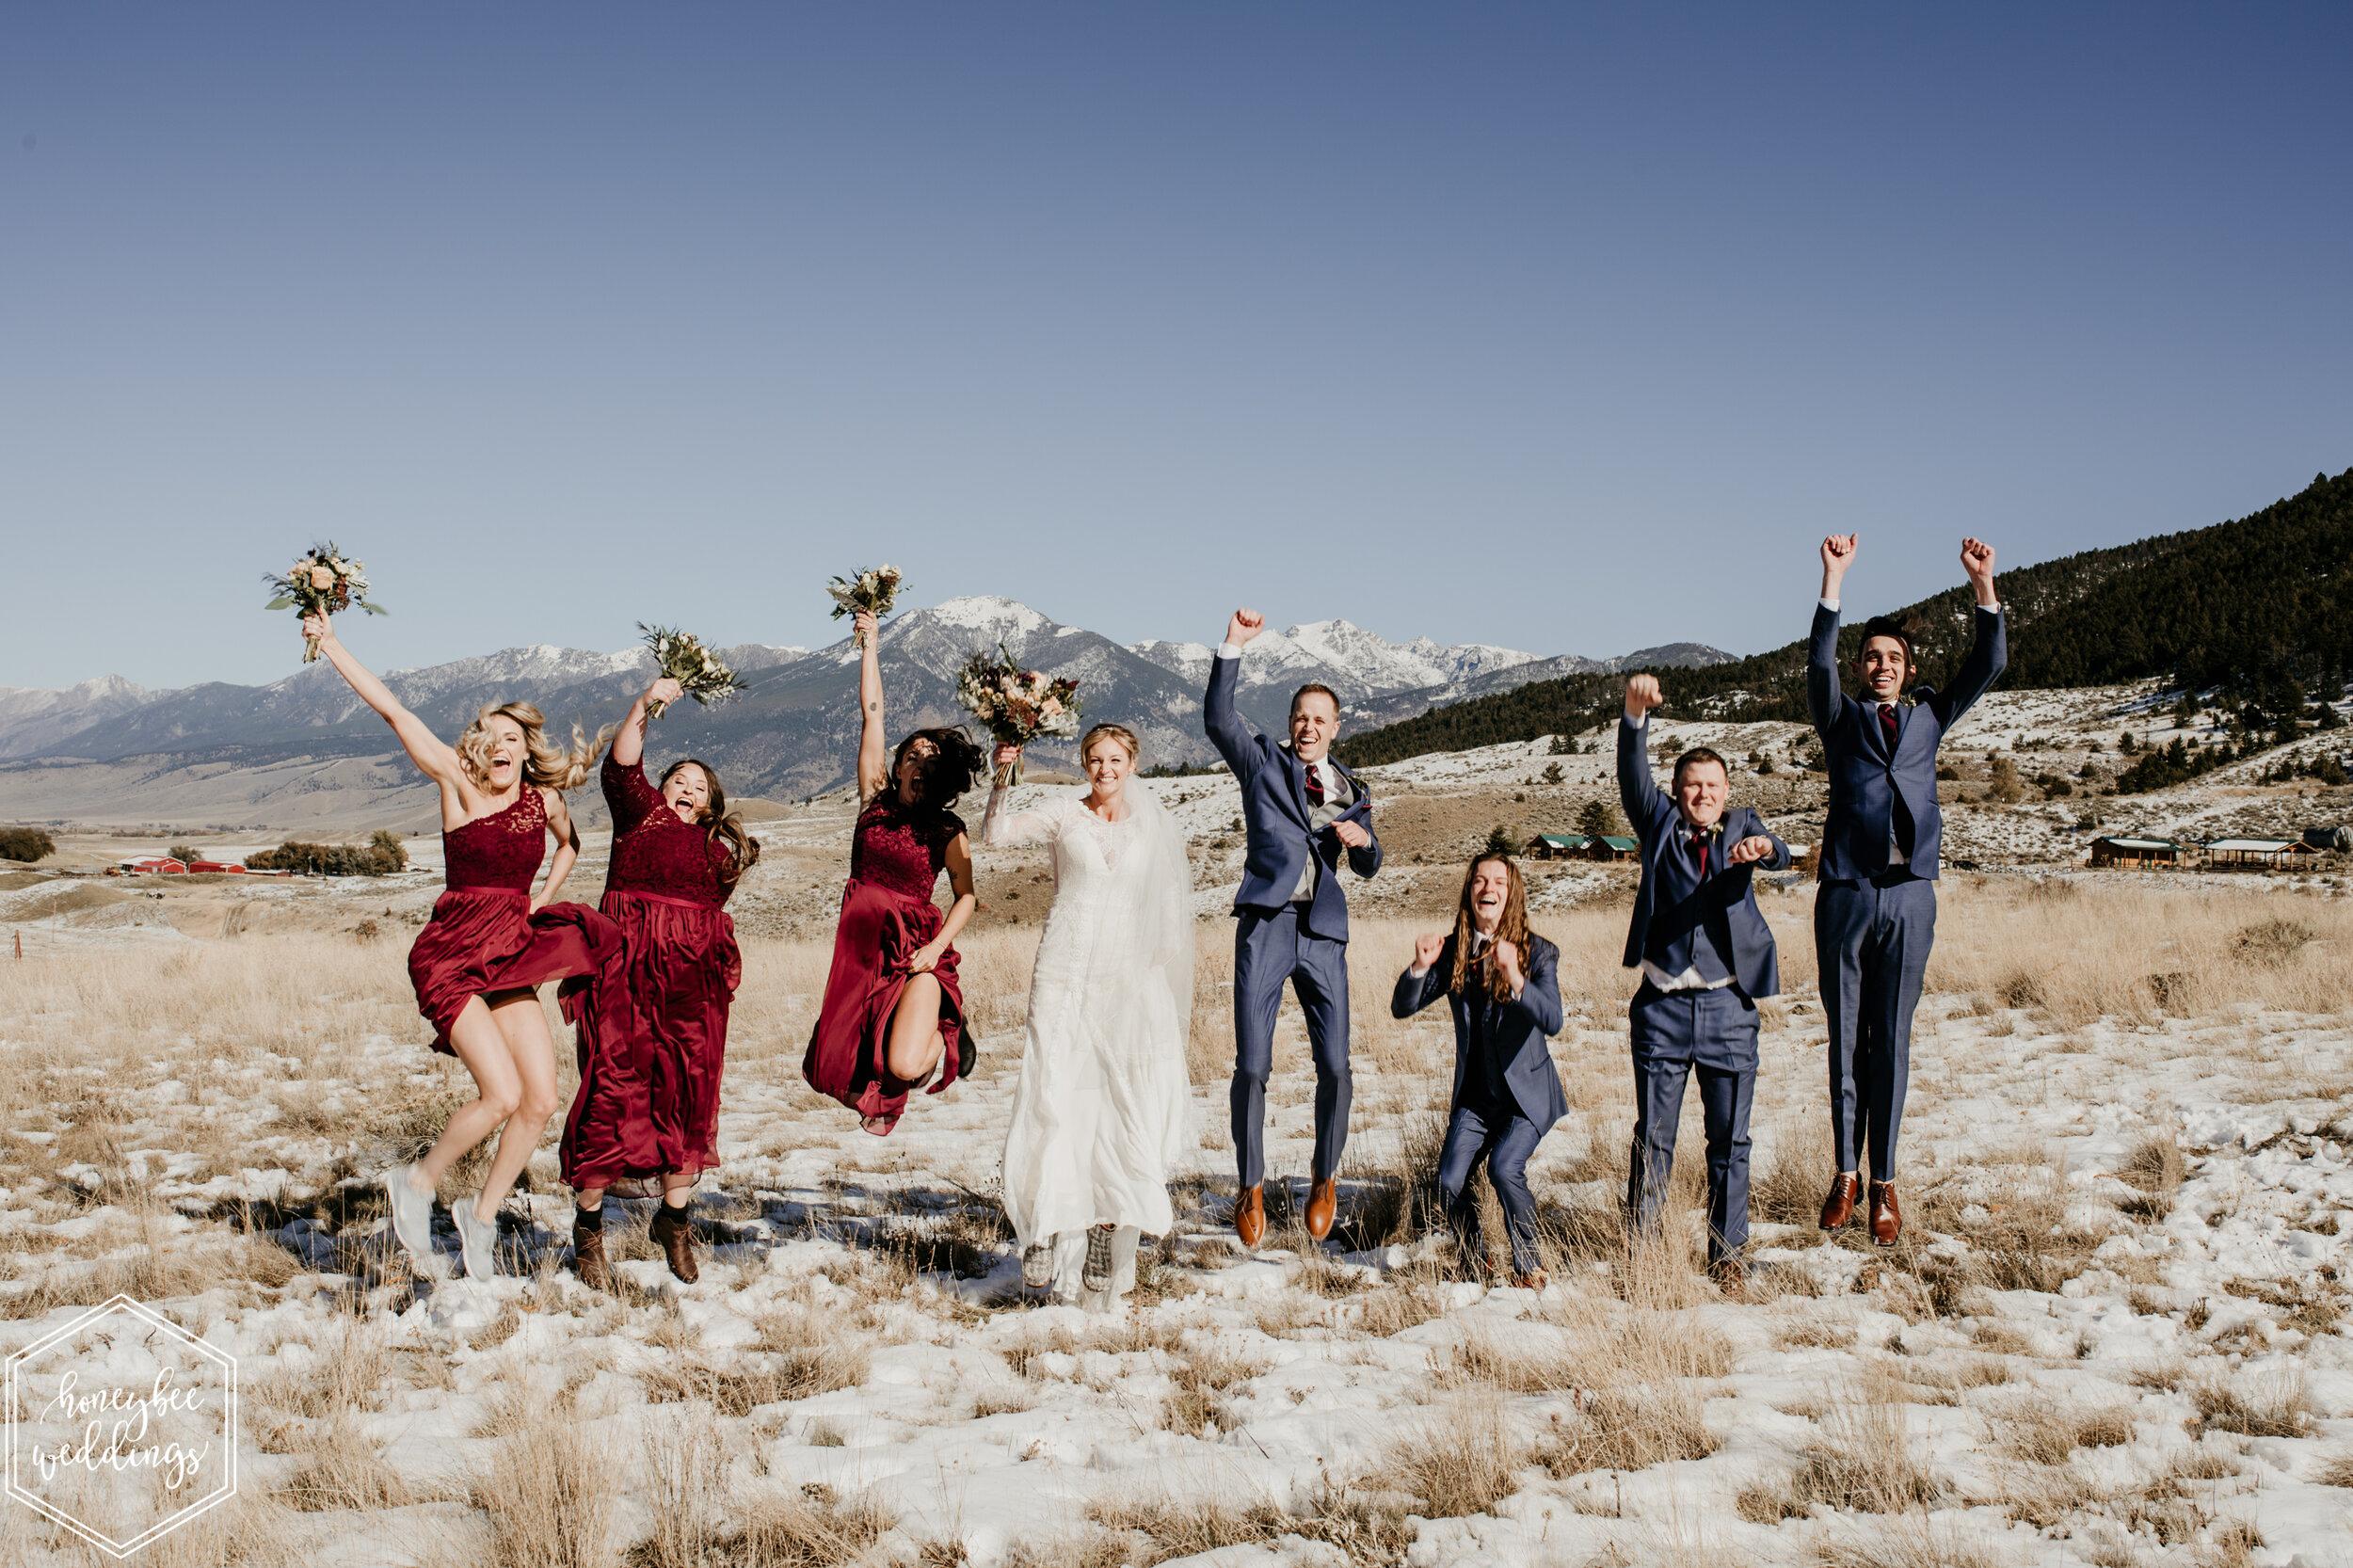 116Chico Hot Springs Wedding_Montana Wedding Photographer_Winter Wedding_Ariel & Richard_October 12, 2019-1507.jpg